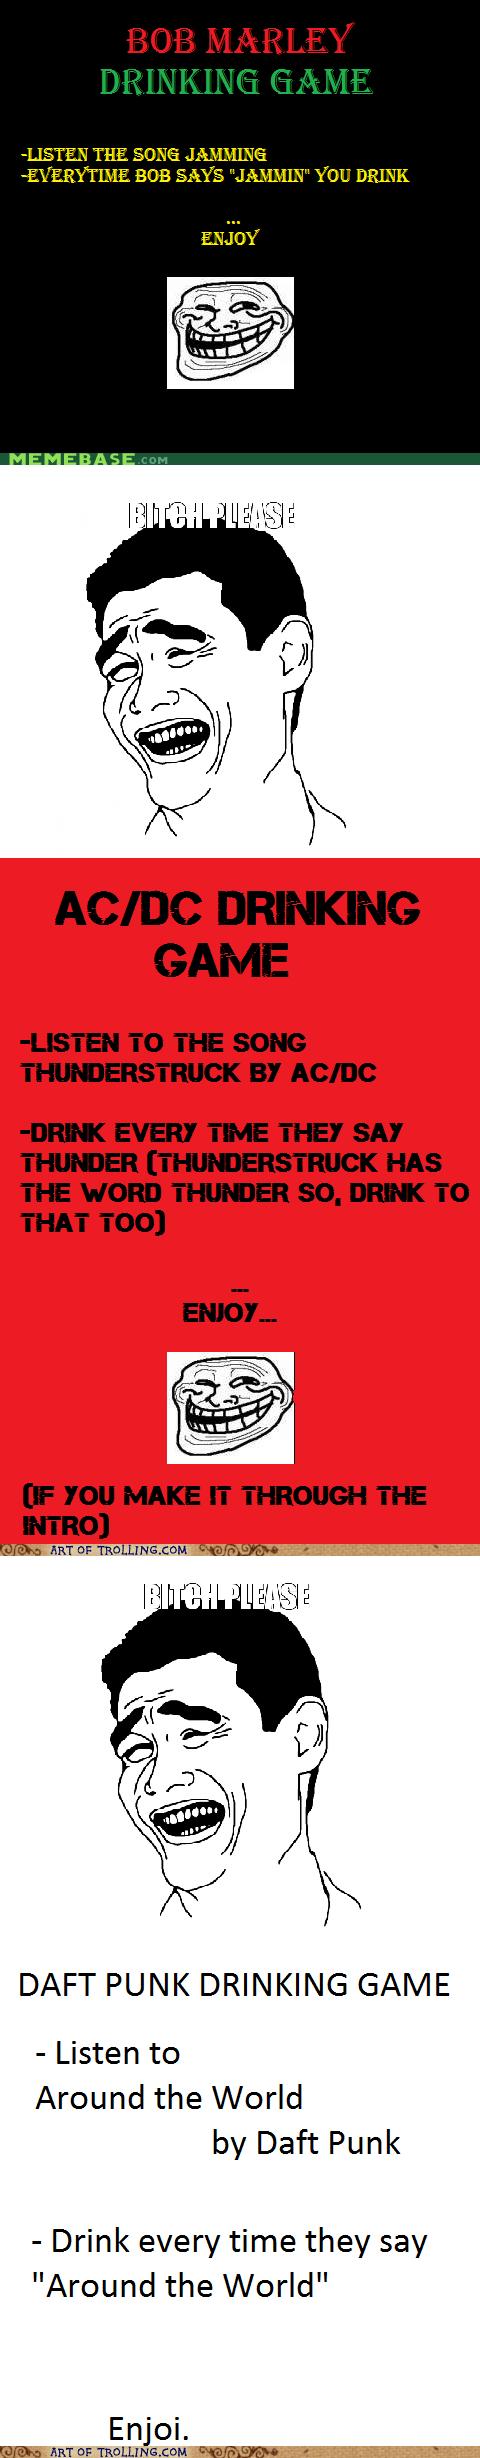 acdc bob marley drinking game daft punk funny - 6041661696